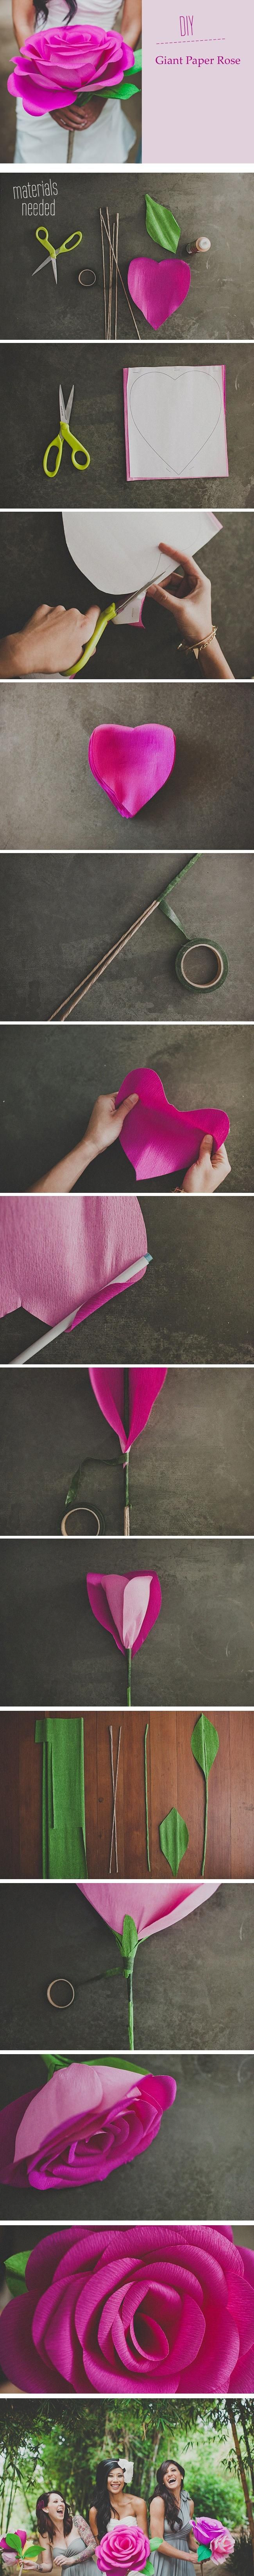 #rose #giant #paper #tutorial #stepbystep